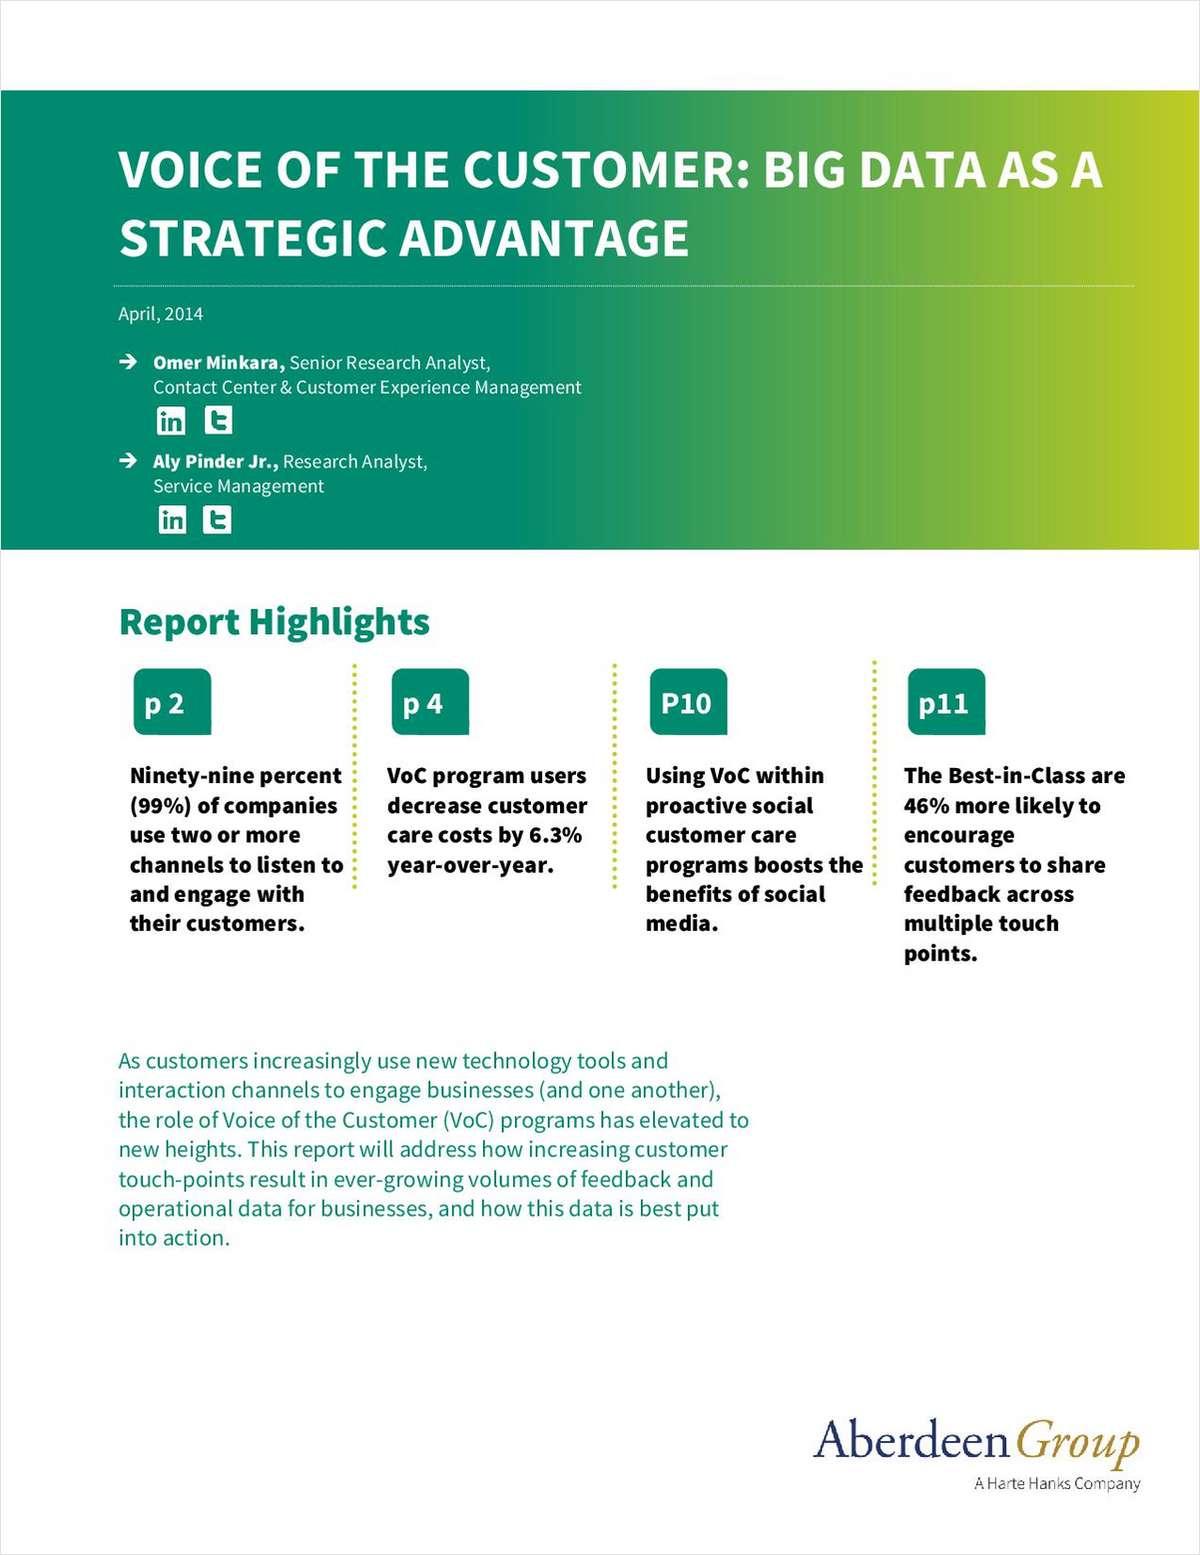 Voice of the Customer: Big Data as a Strategic Advantage